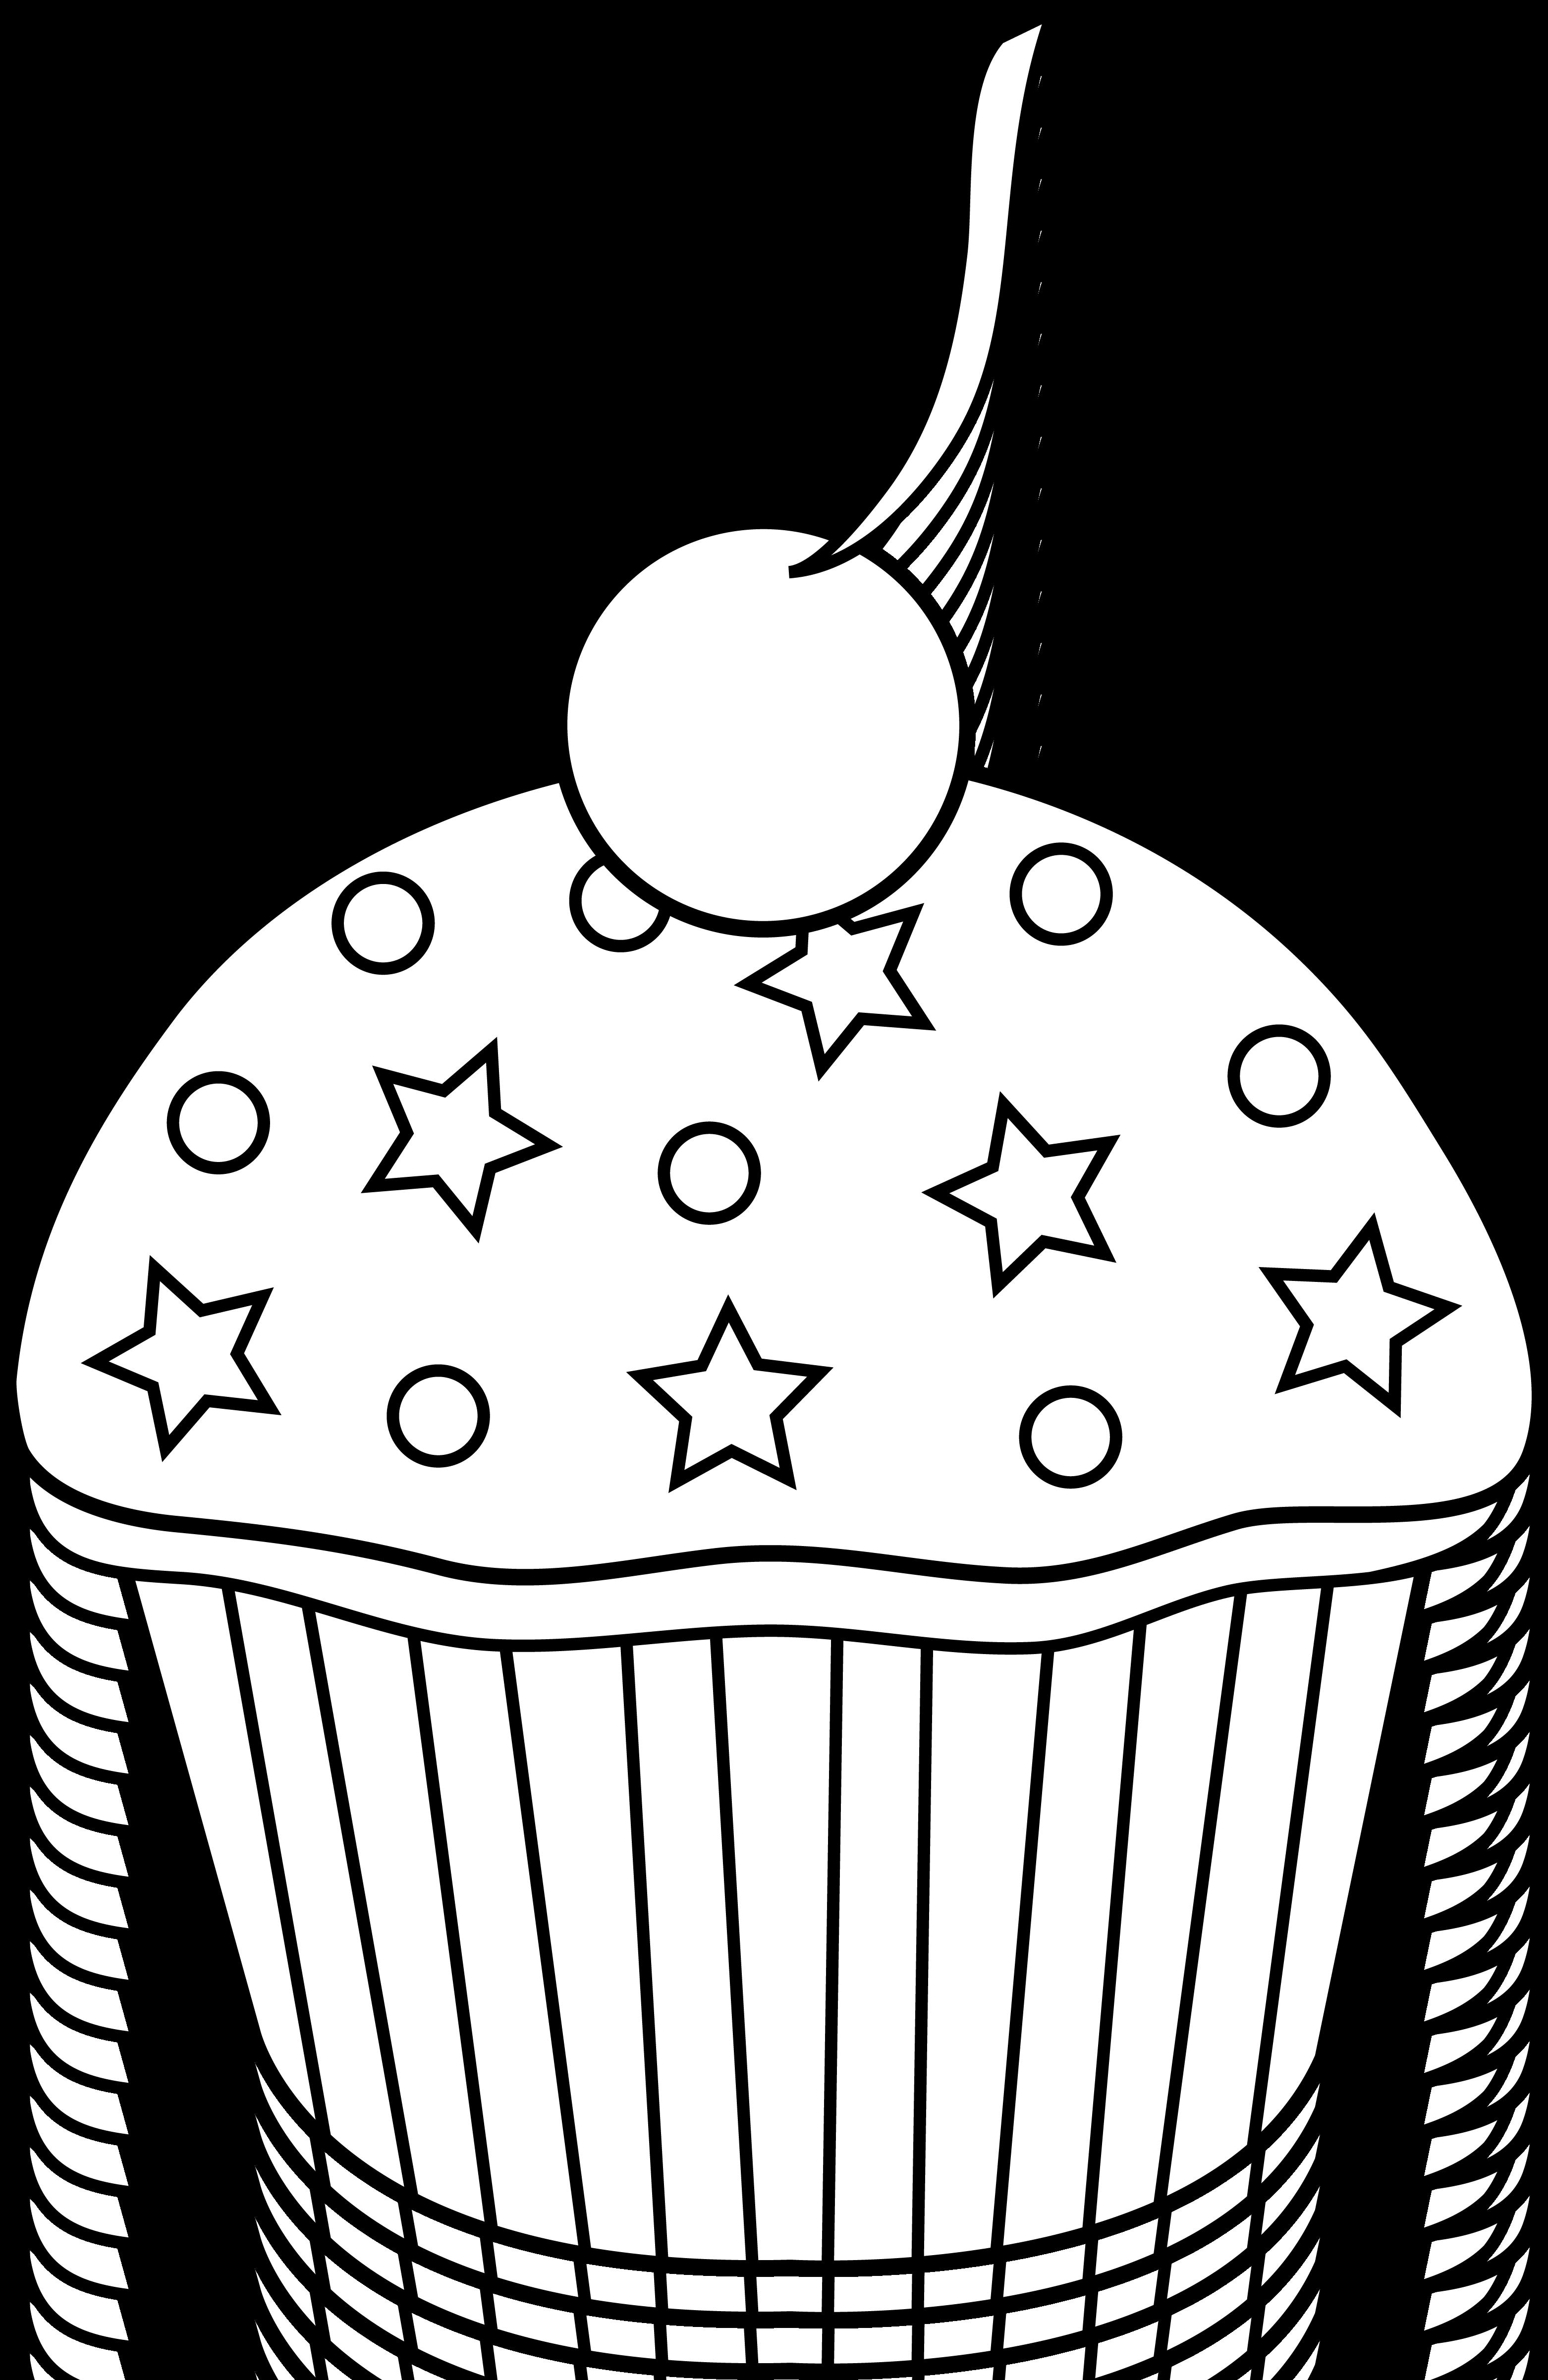 Cute clipart dessert. Colorable cupcake design free